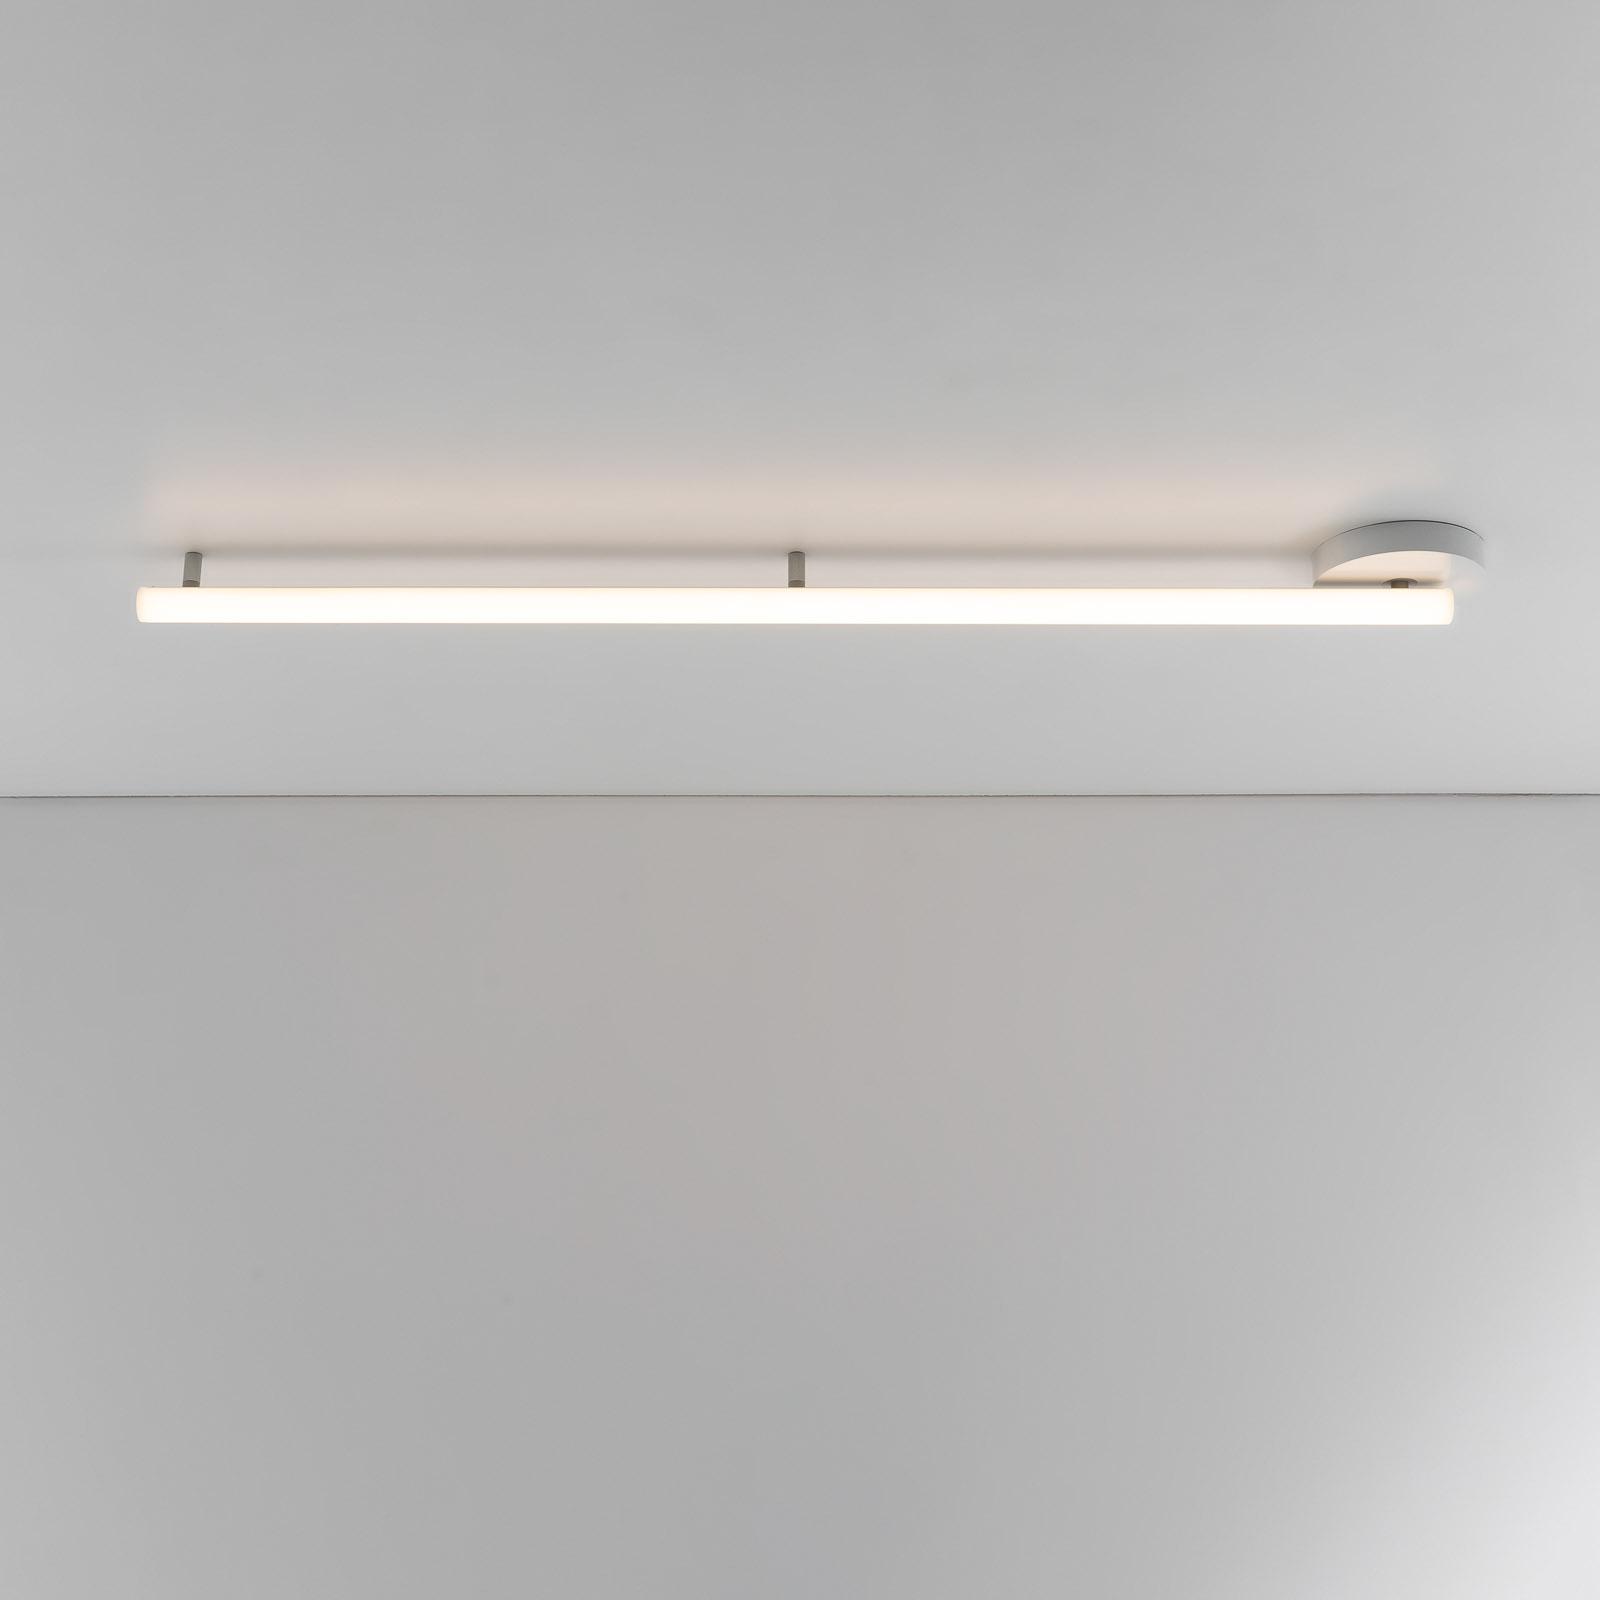 Artemide Alphabet of light lineær loft app 120